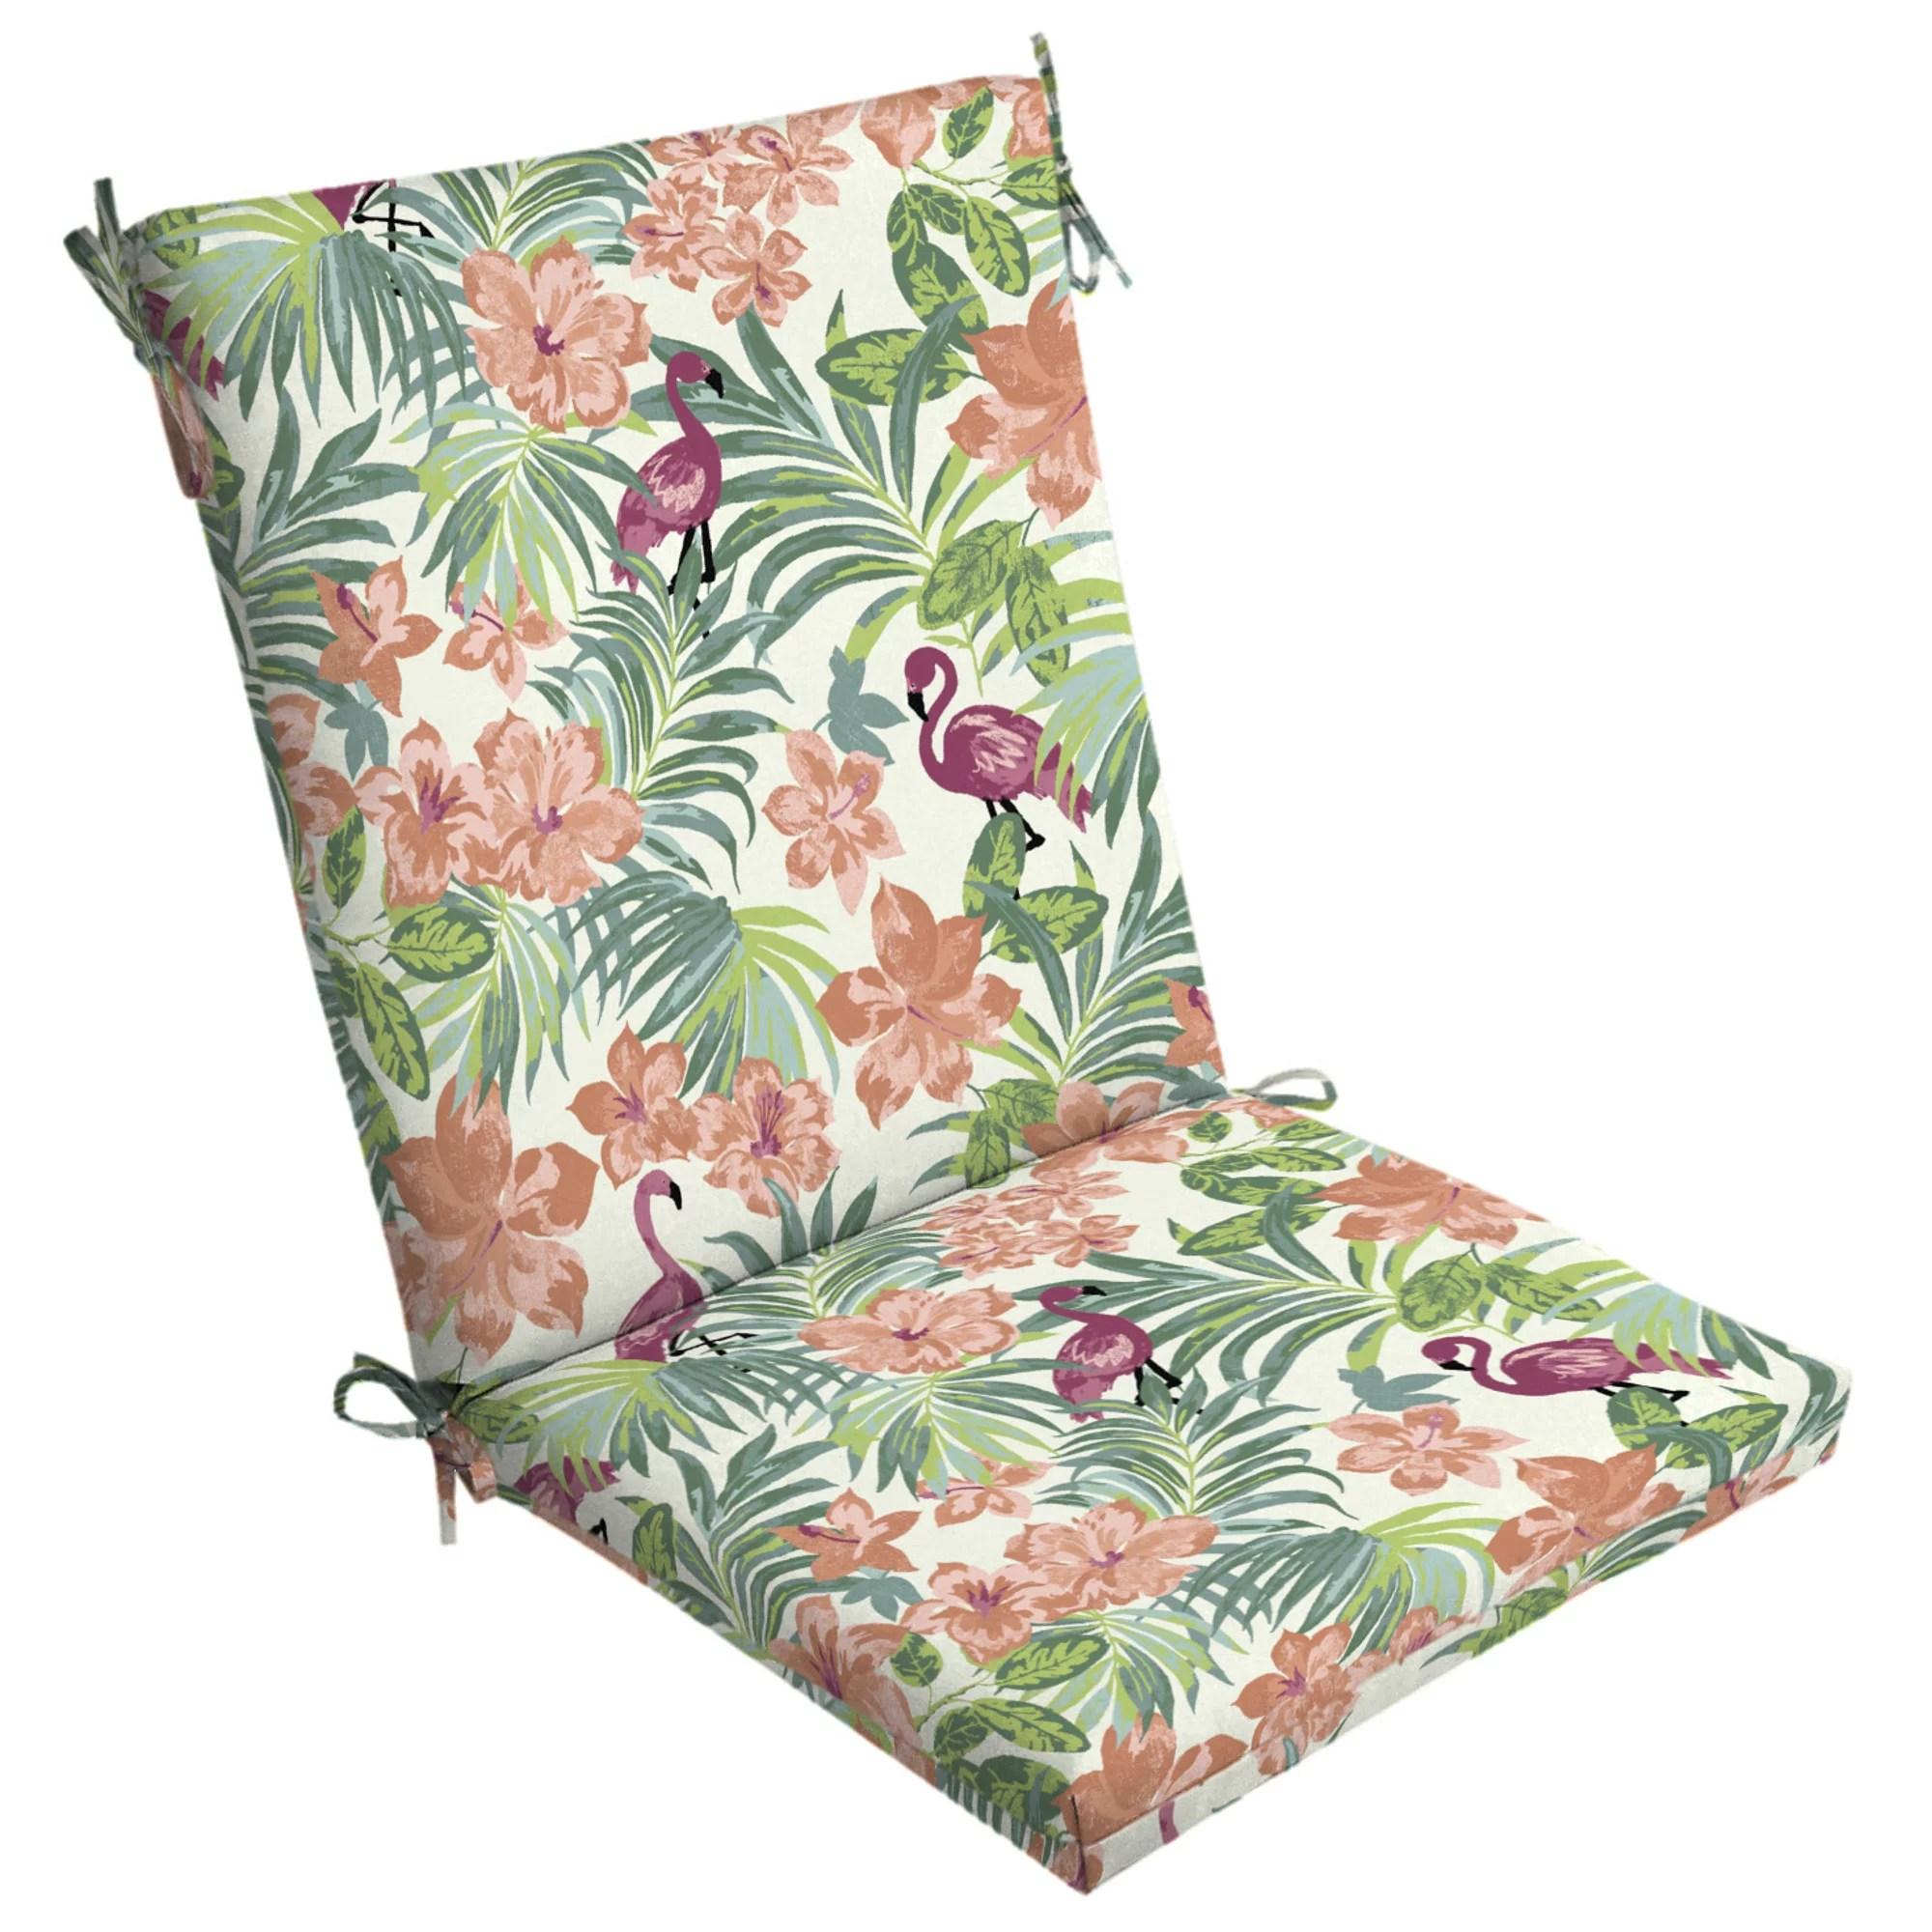 arden selections luau flamingo tropical 44 x 20 in outdoor chair cushion